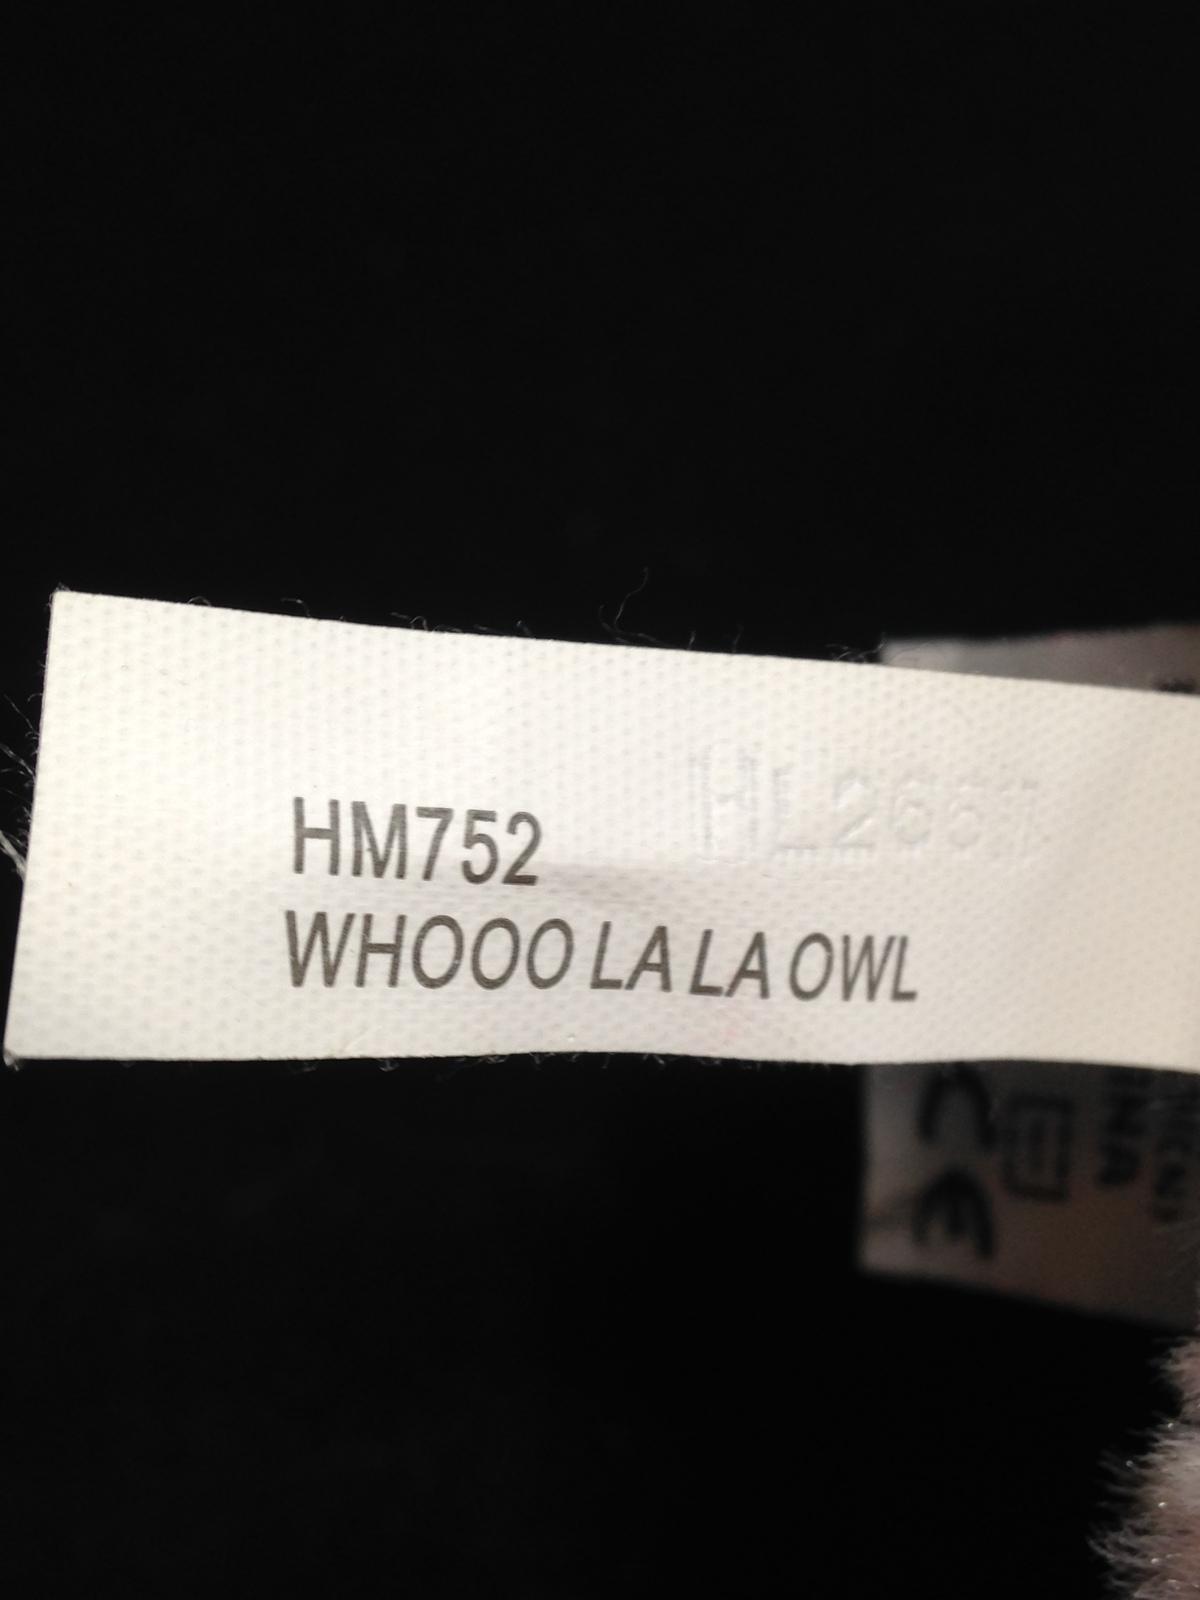 "Ganz Webkinz Whooo La La Owl Pink Plush Iridescent Soft Toy HM752 -NO CODE 8"""